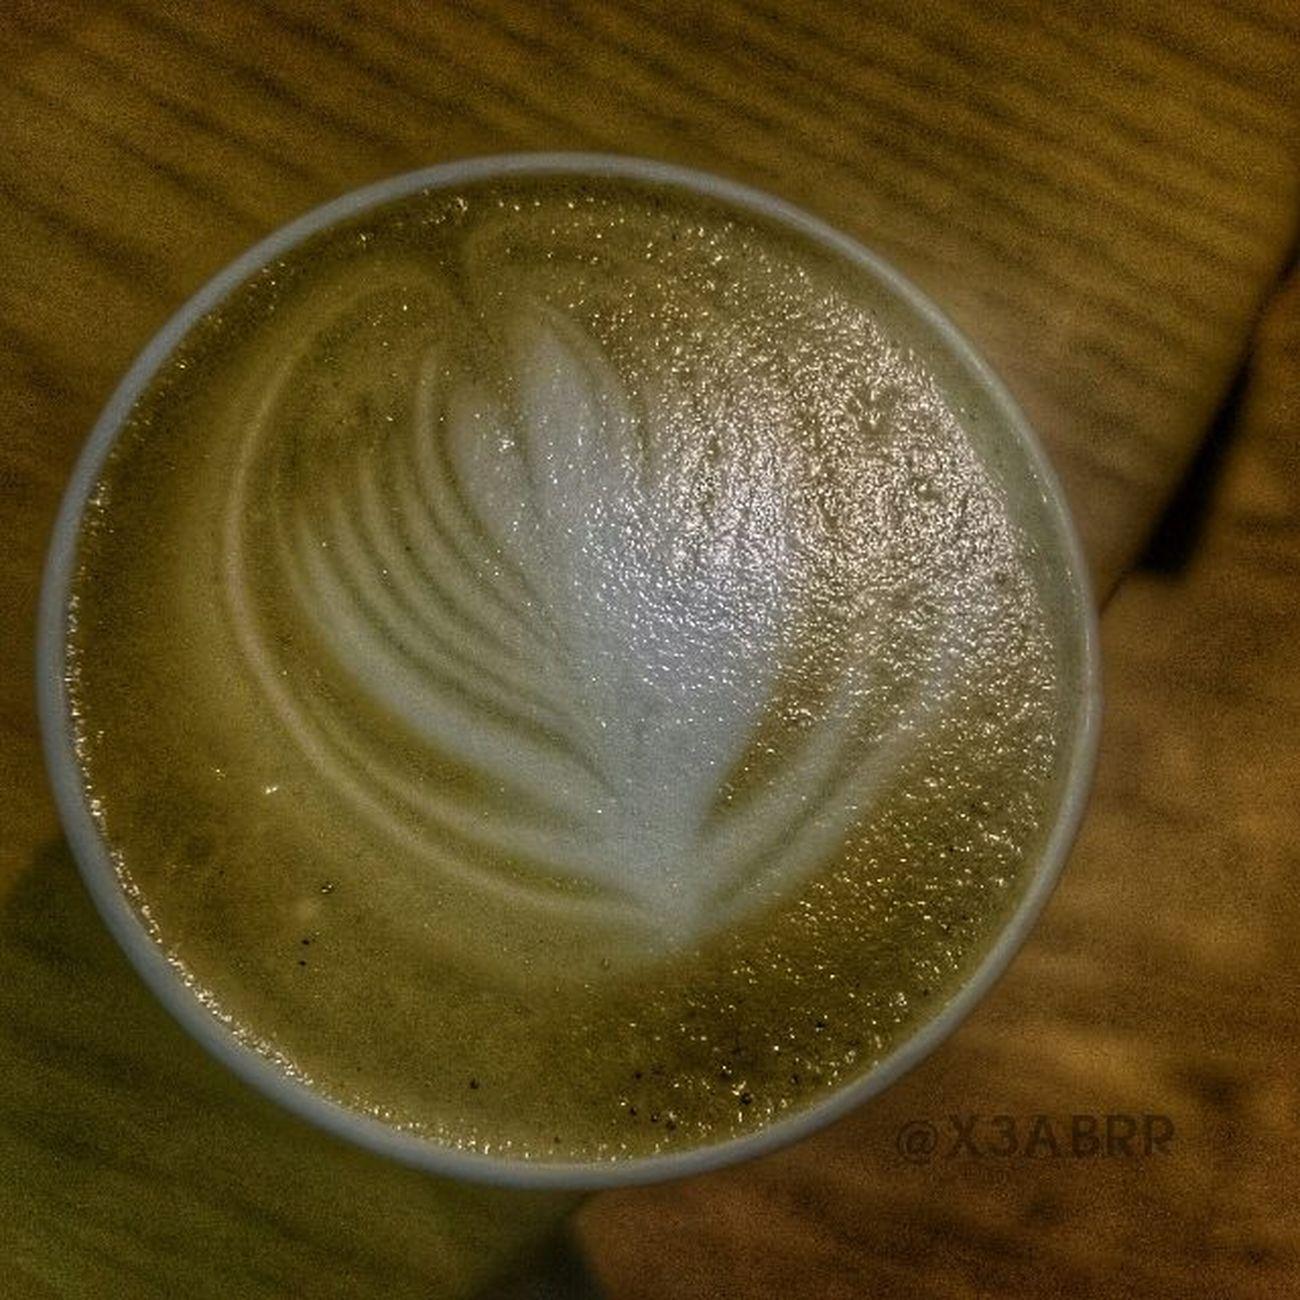 Colorful HDR Nature Coffee ☕ قهوة كابتشينو لاتيه تصويري  الرياض السعودية  كوستا كوستا_كافي Costa Costa_caffee Costa Coffee Cappuccino Latte